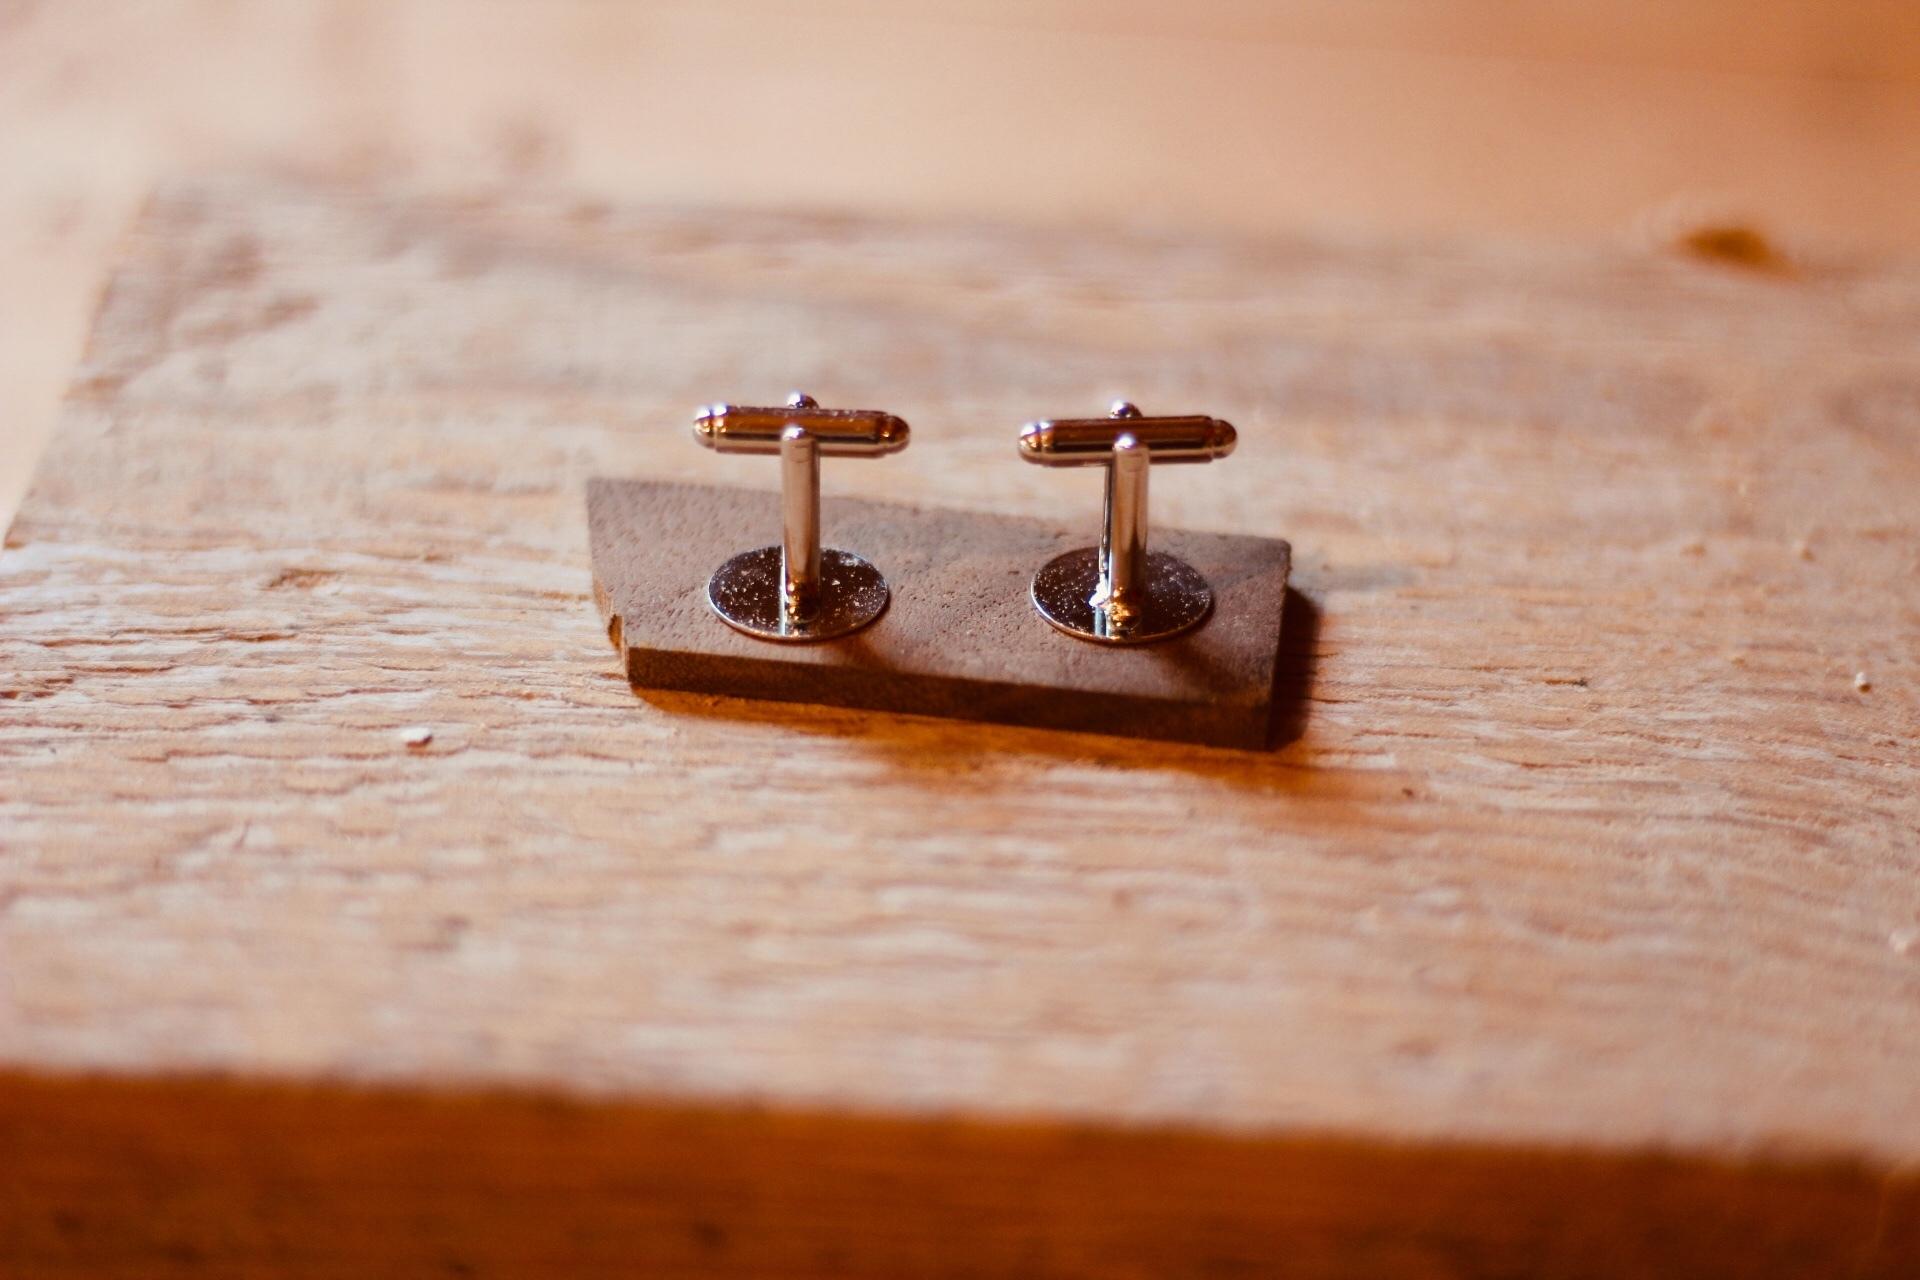 wooden custom cufflinks - step 1